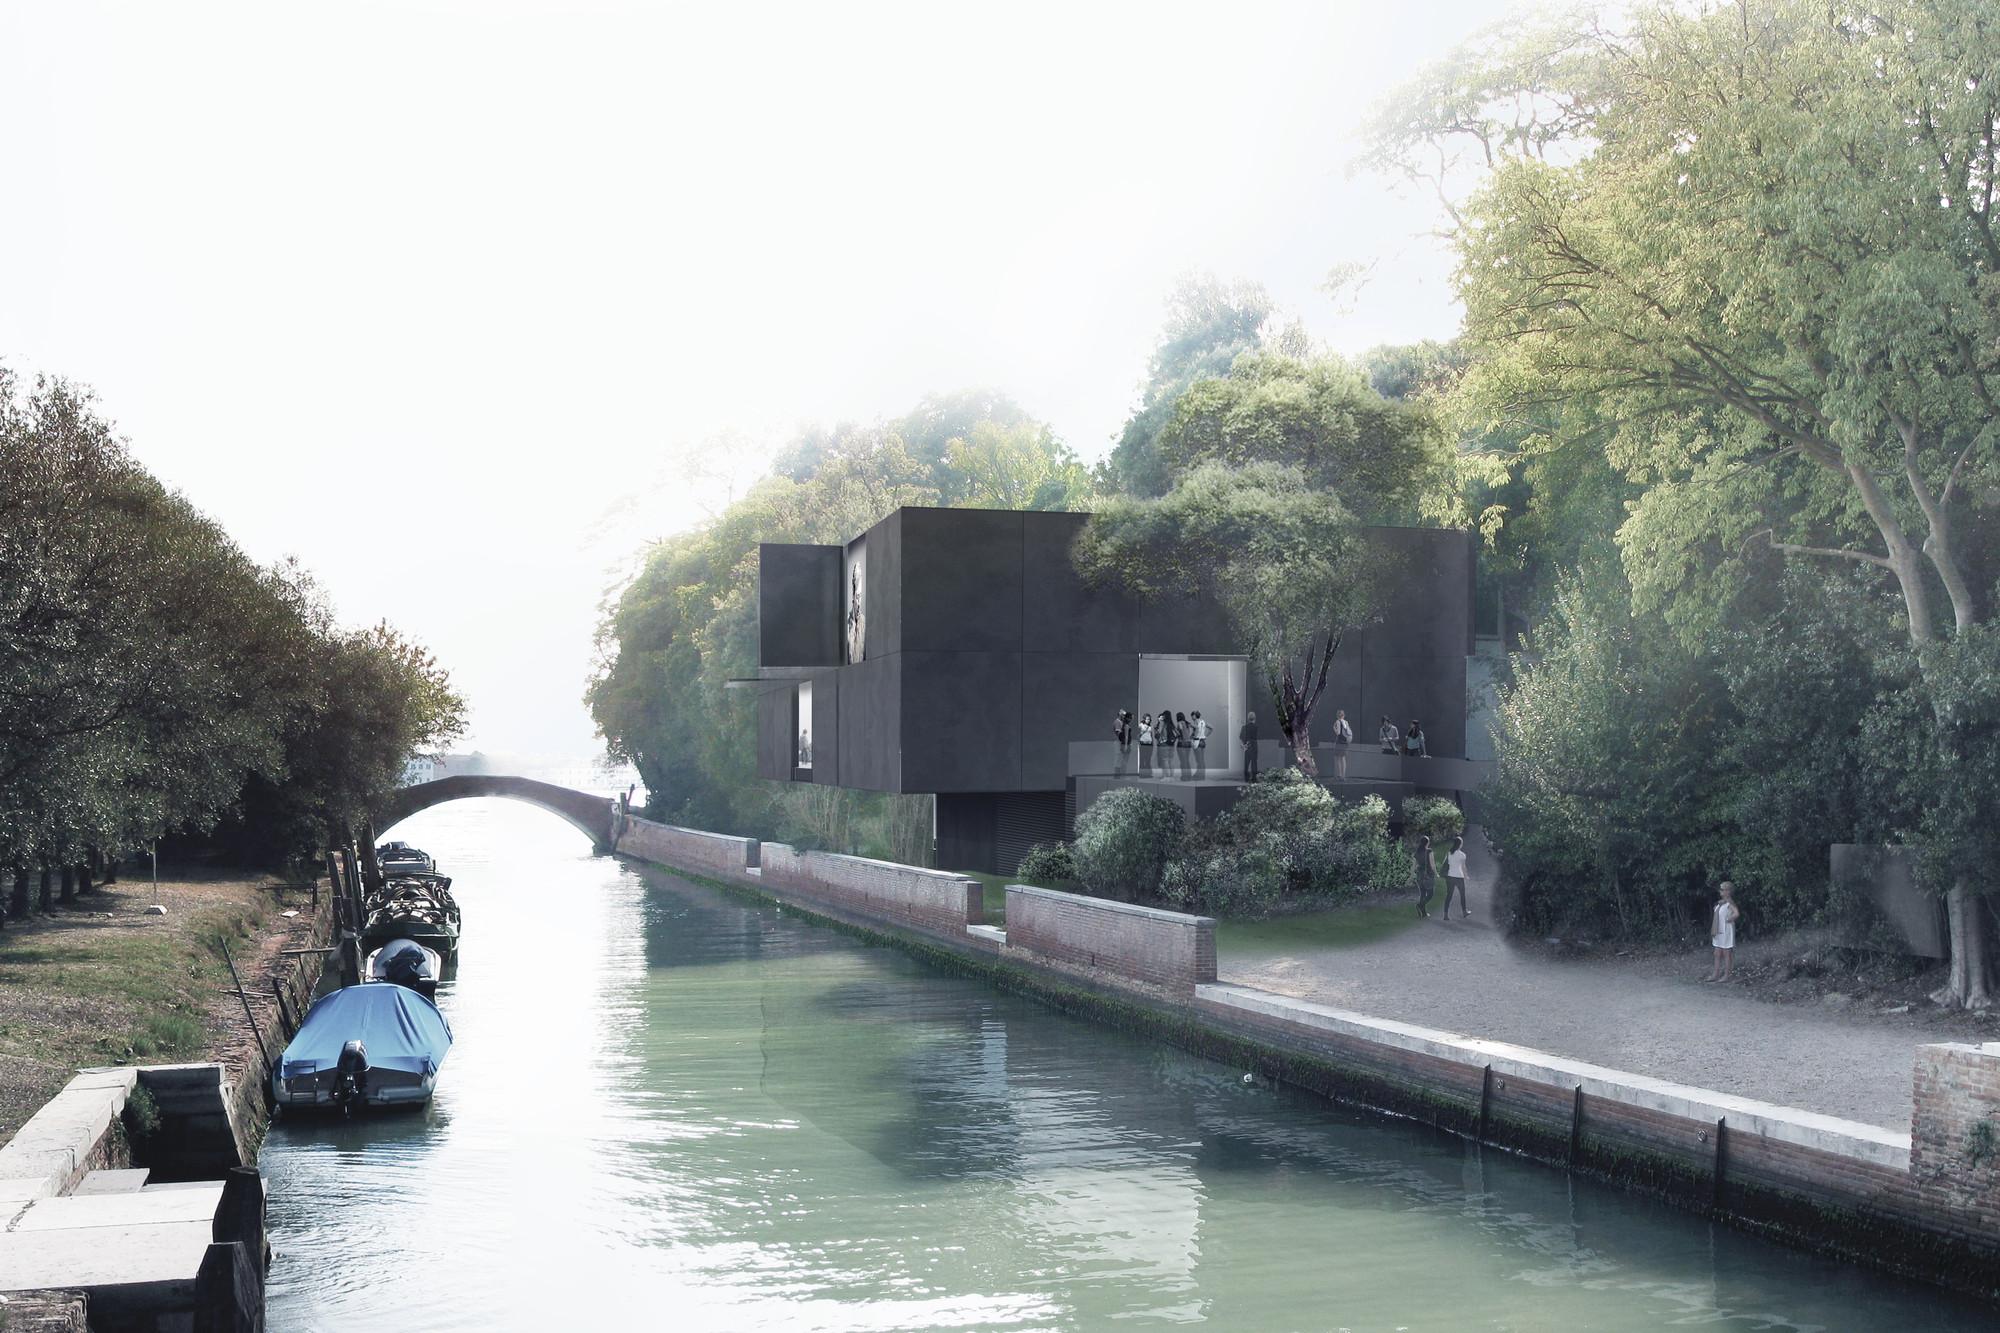 Denton Corker Marshall To Design First 21st Century Pavilion in Venice's Giardini